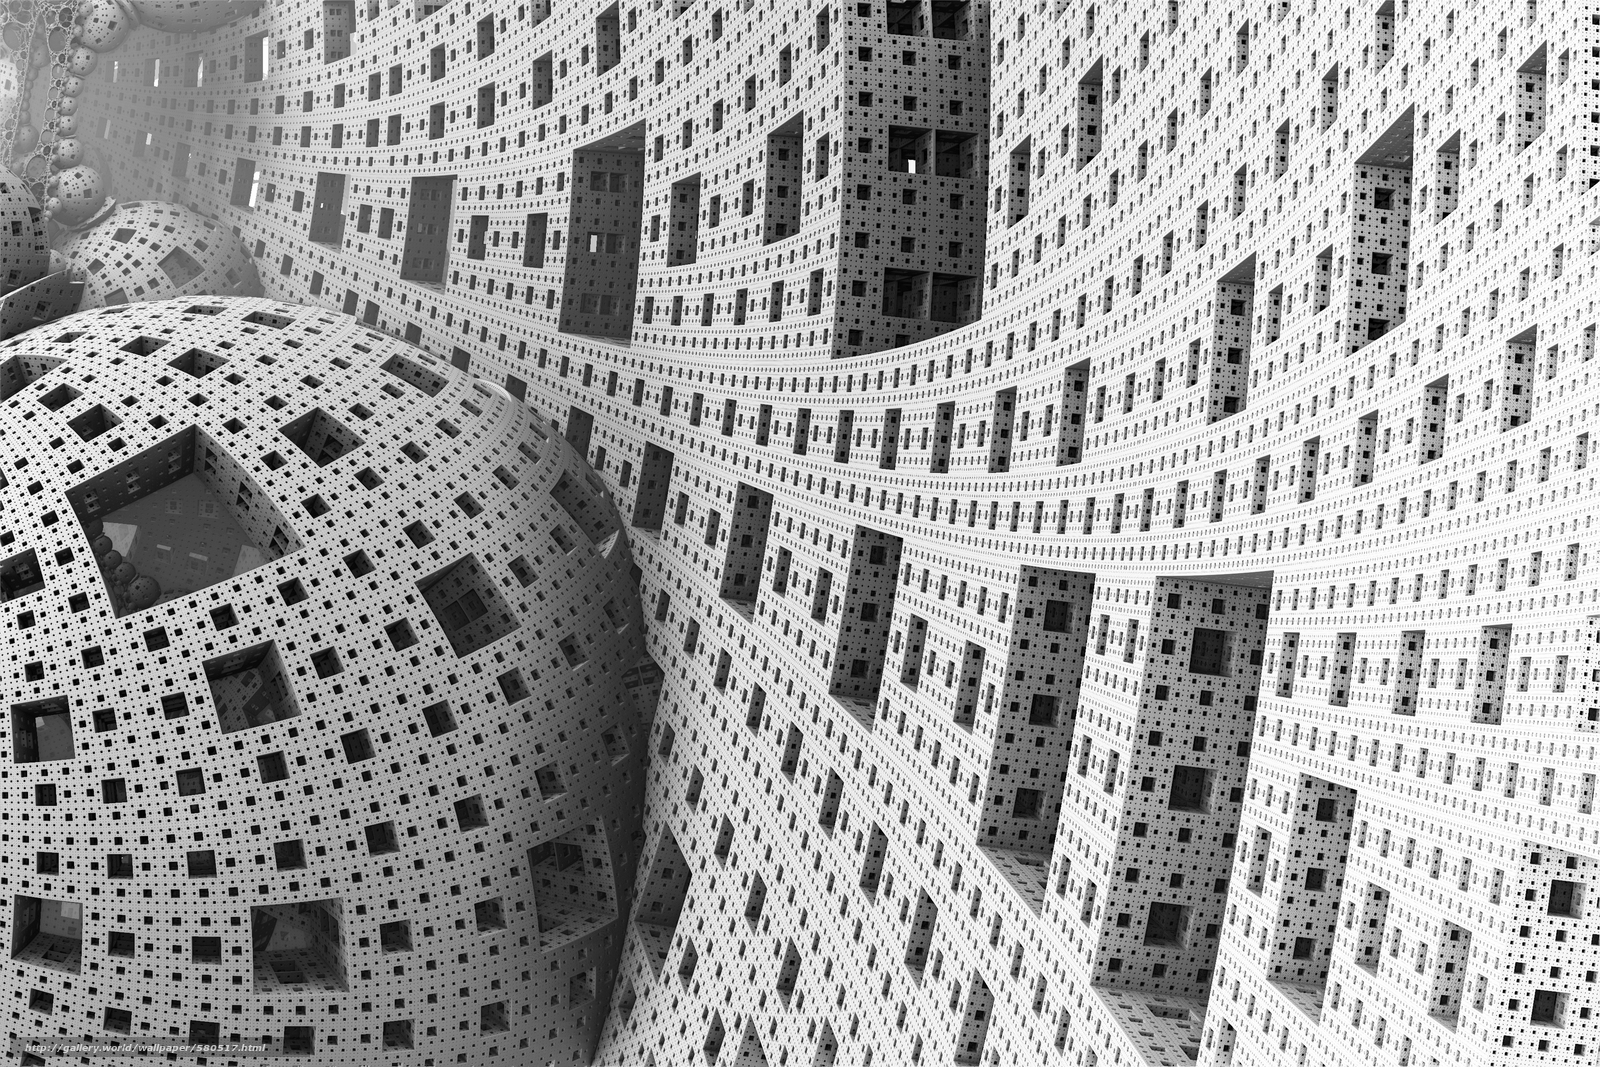 кубы, искажение, рендер, клетки, шары